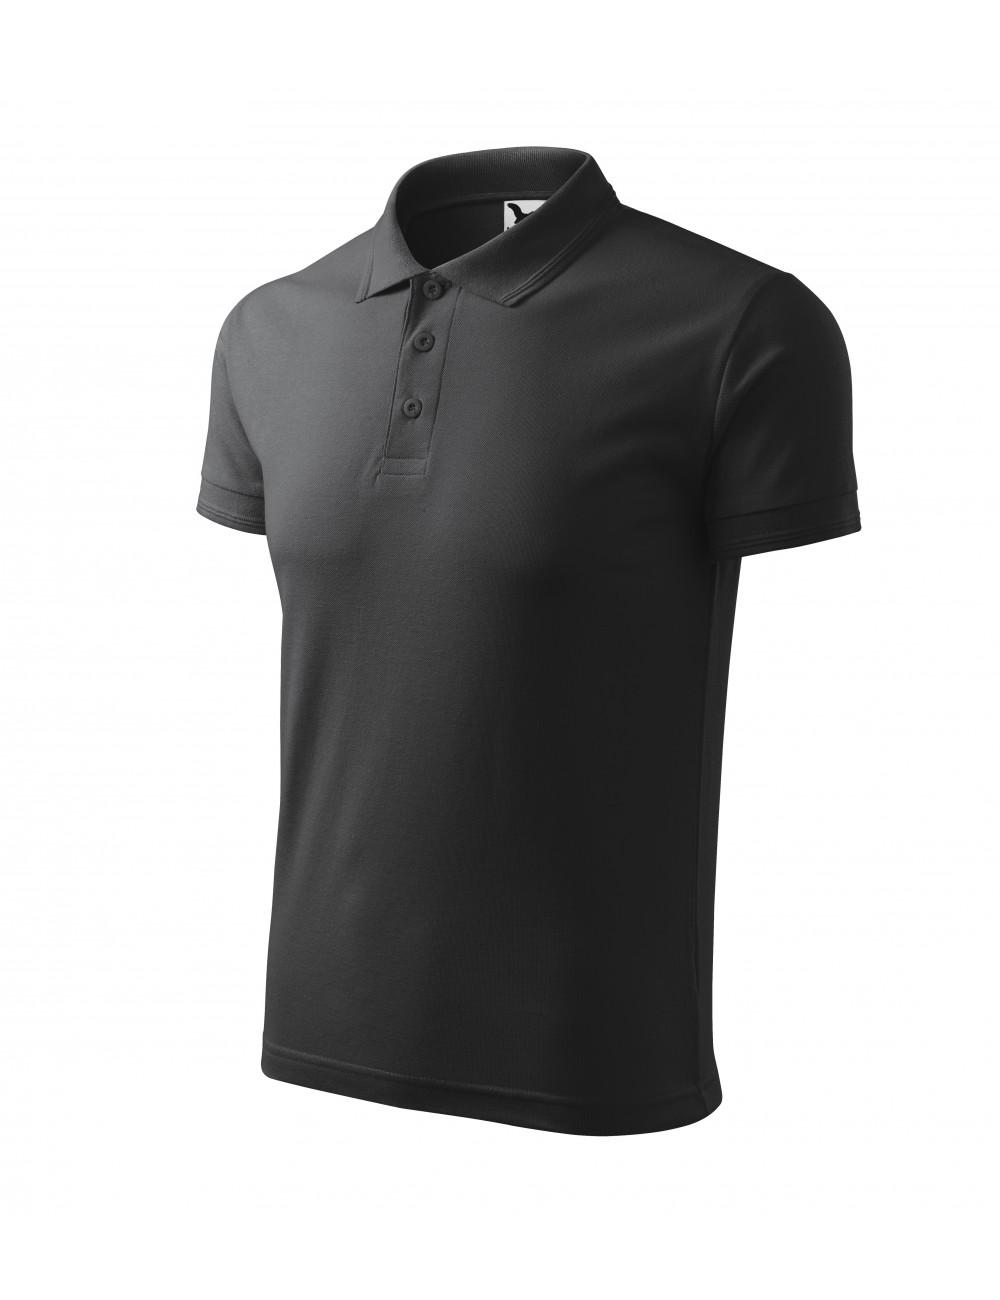 Adler MALFINI Koszulka polo męska Pique Polo 203 antracytowy melanż